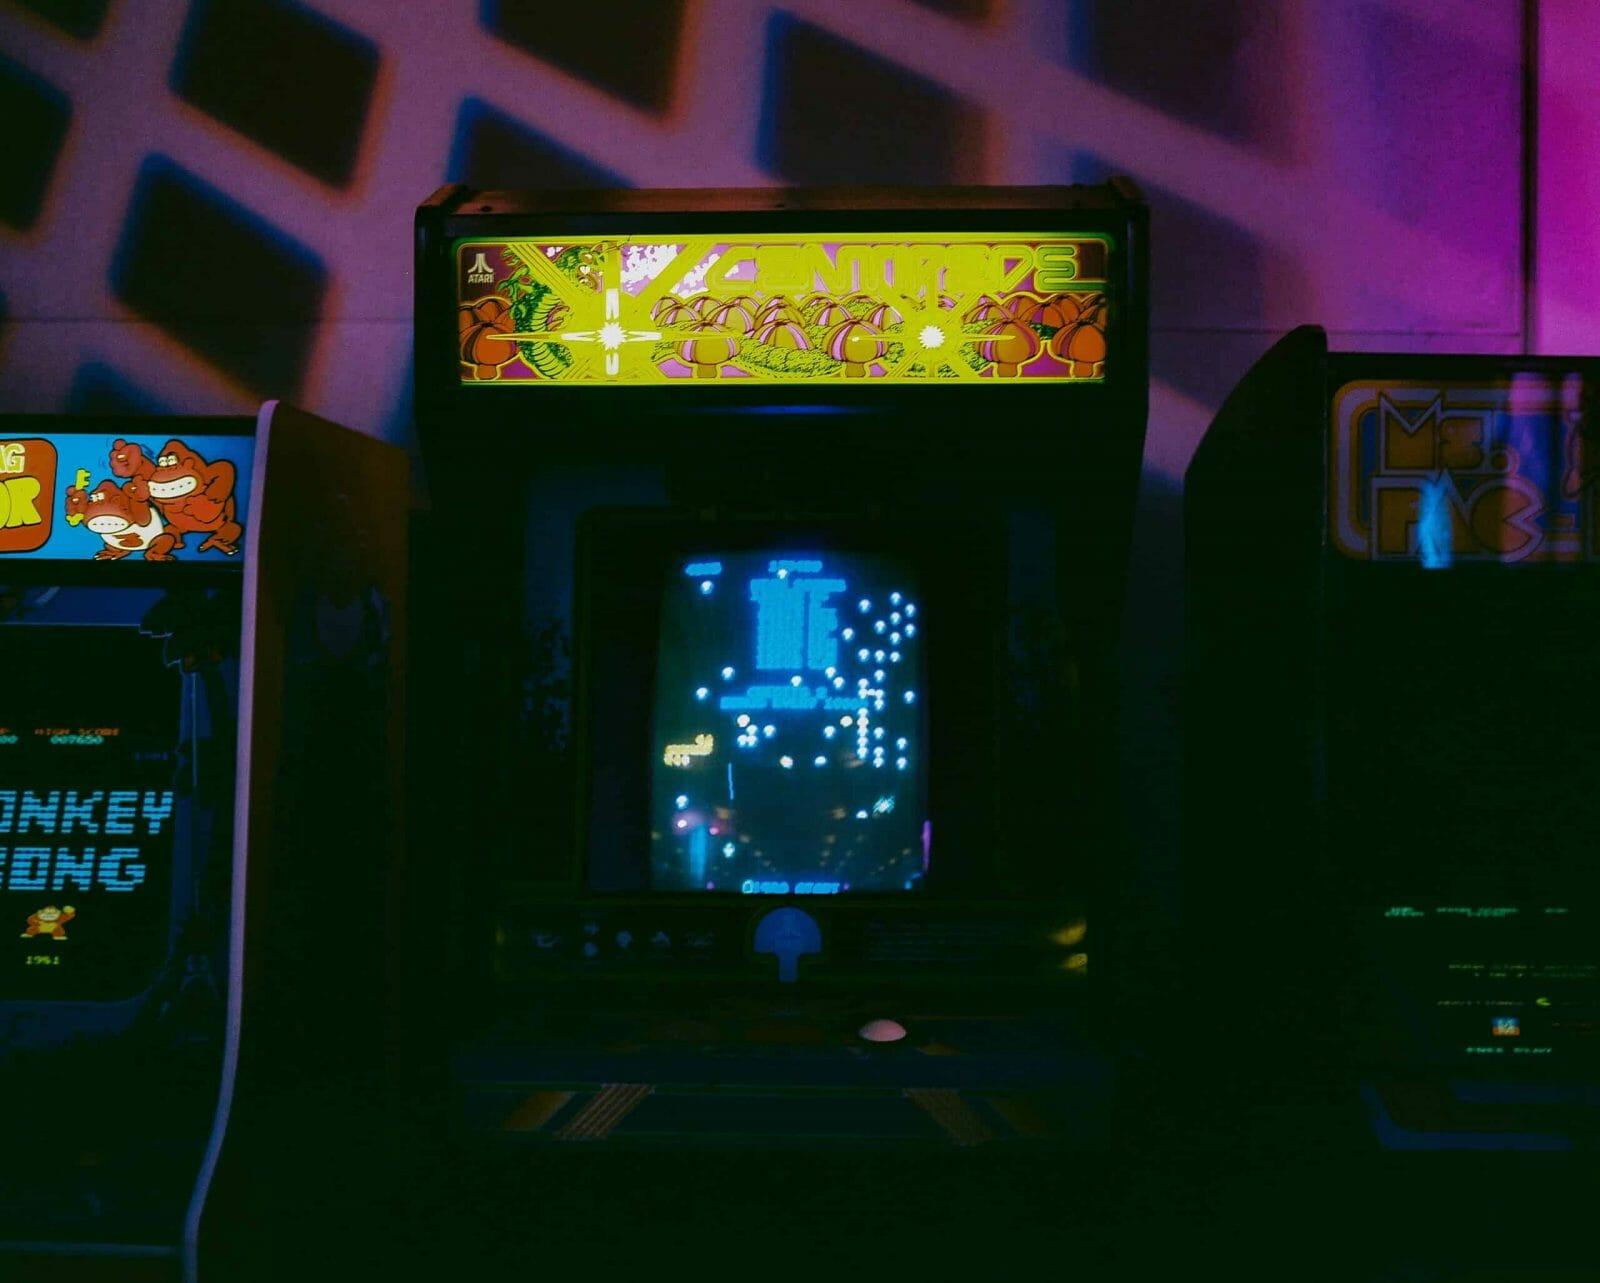 An image showing an arcade machine